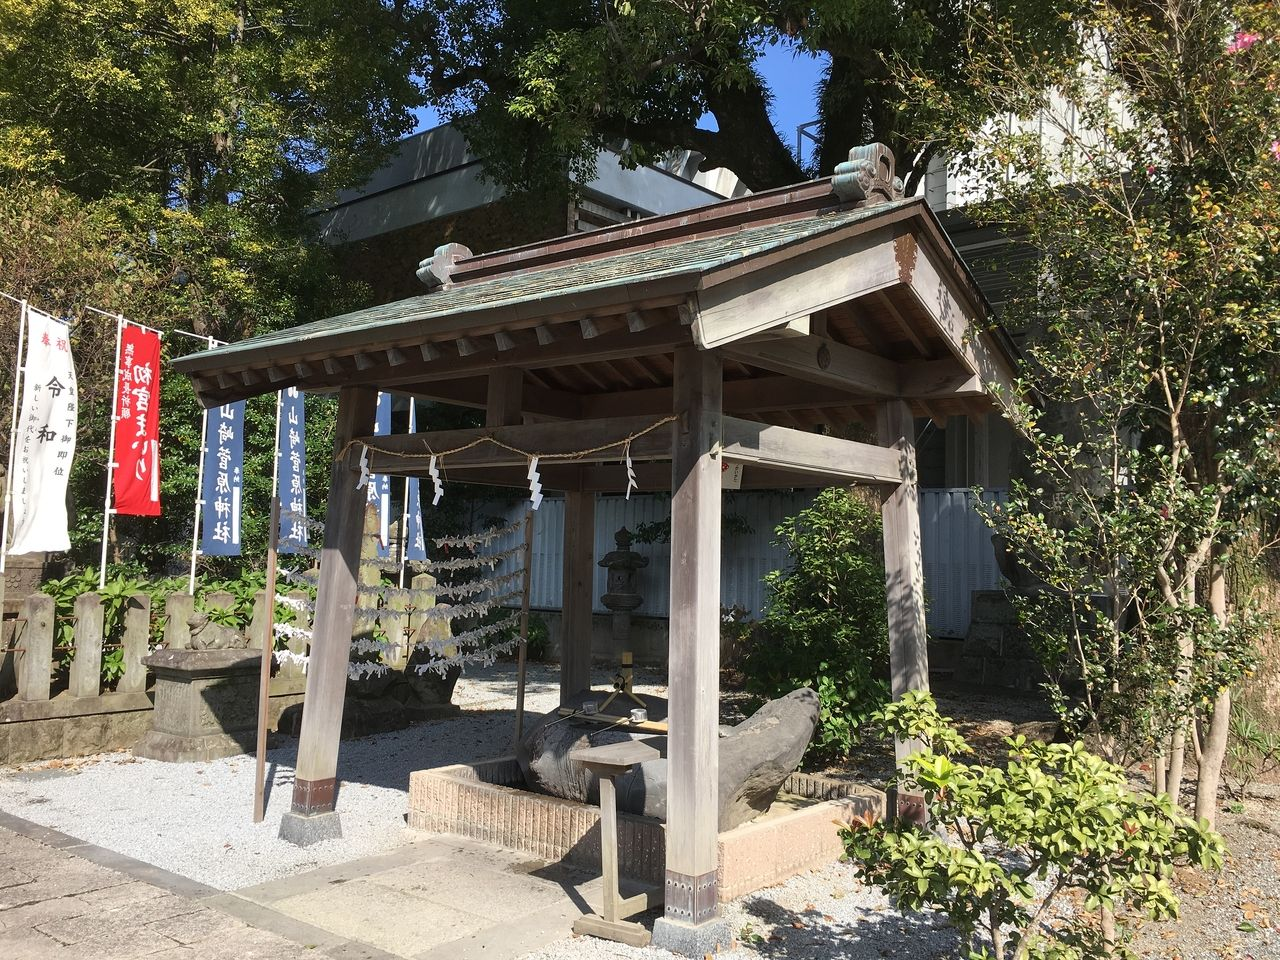 山崎菅原神社・手洗い場